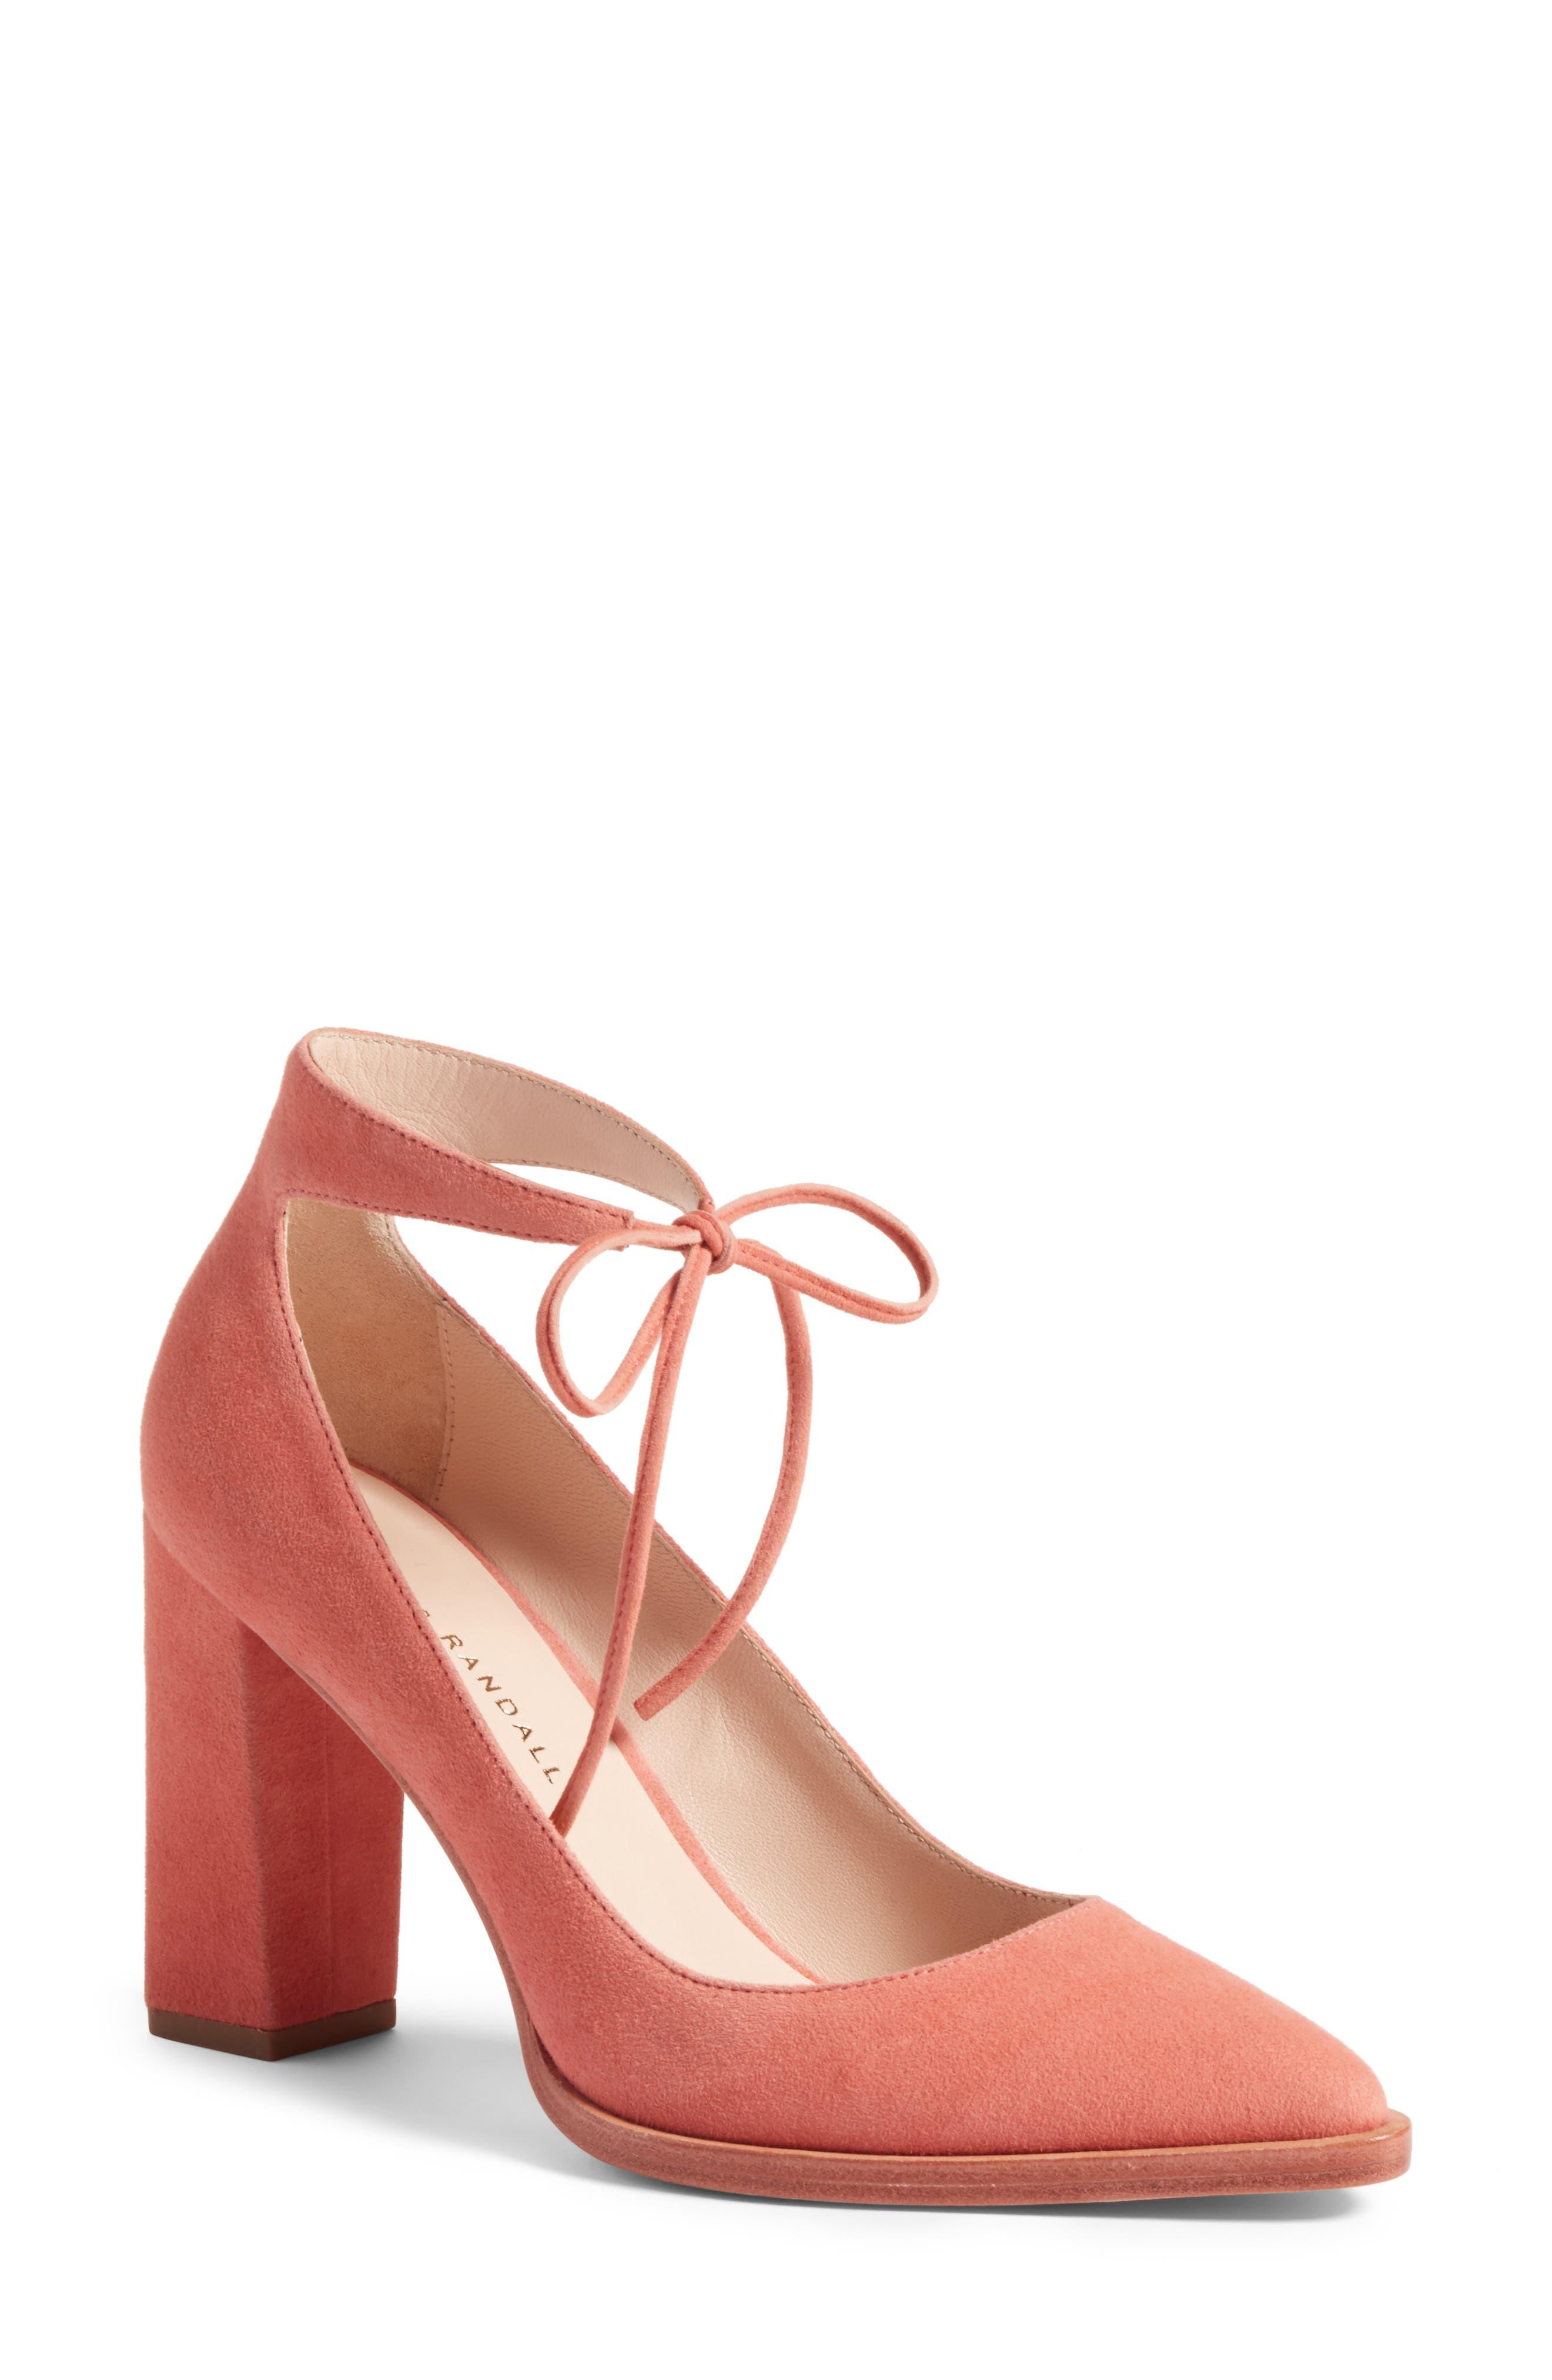 Loeffler Randall Rita Ankle Strap Pointy Toe Pump (Women)